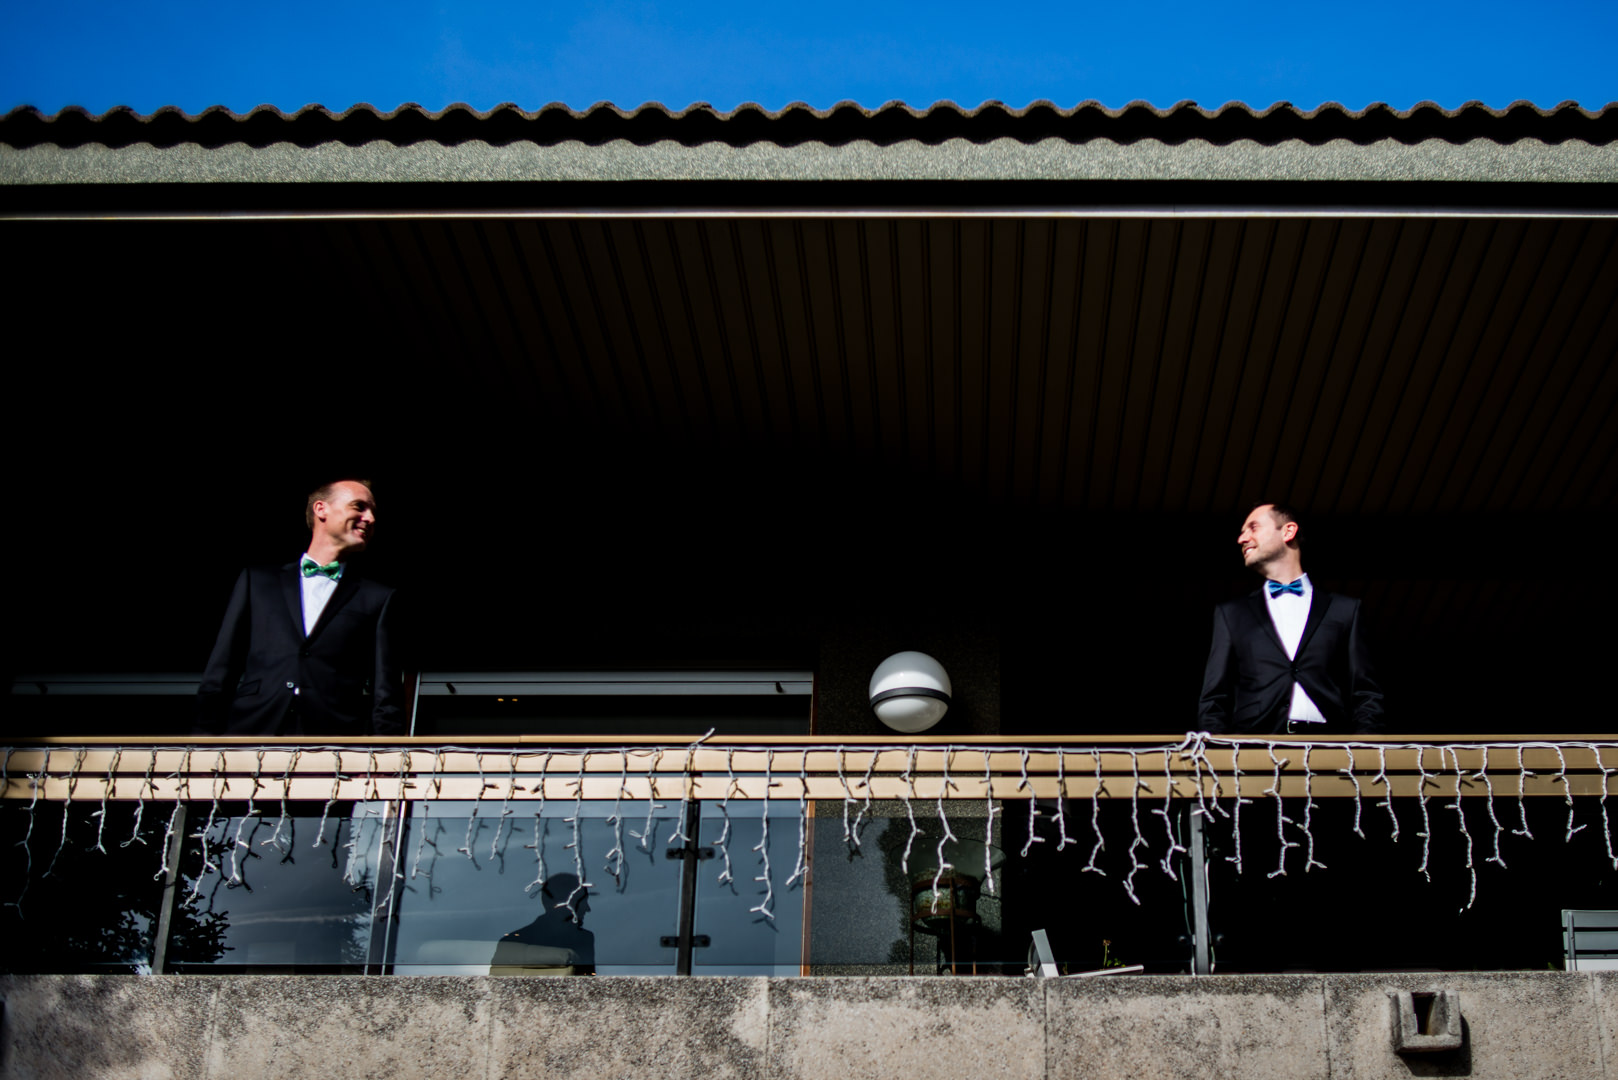 Same-sex-wedding-barcelona-boda- gay-samesex-engagement-Rafael-Torres-fotografo-bodas-sevilla-madrid-barcelona-wedding-photographer--6.jpg